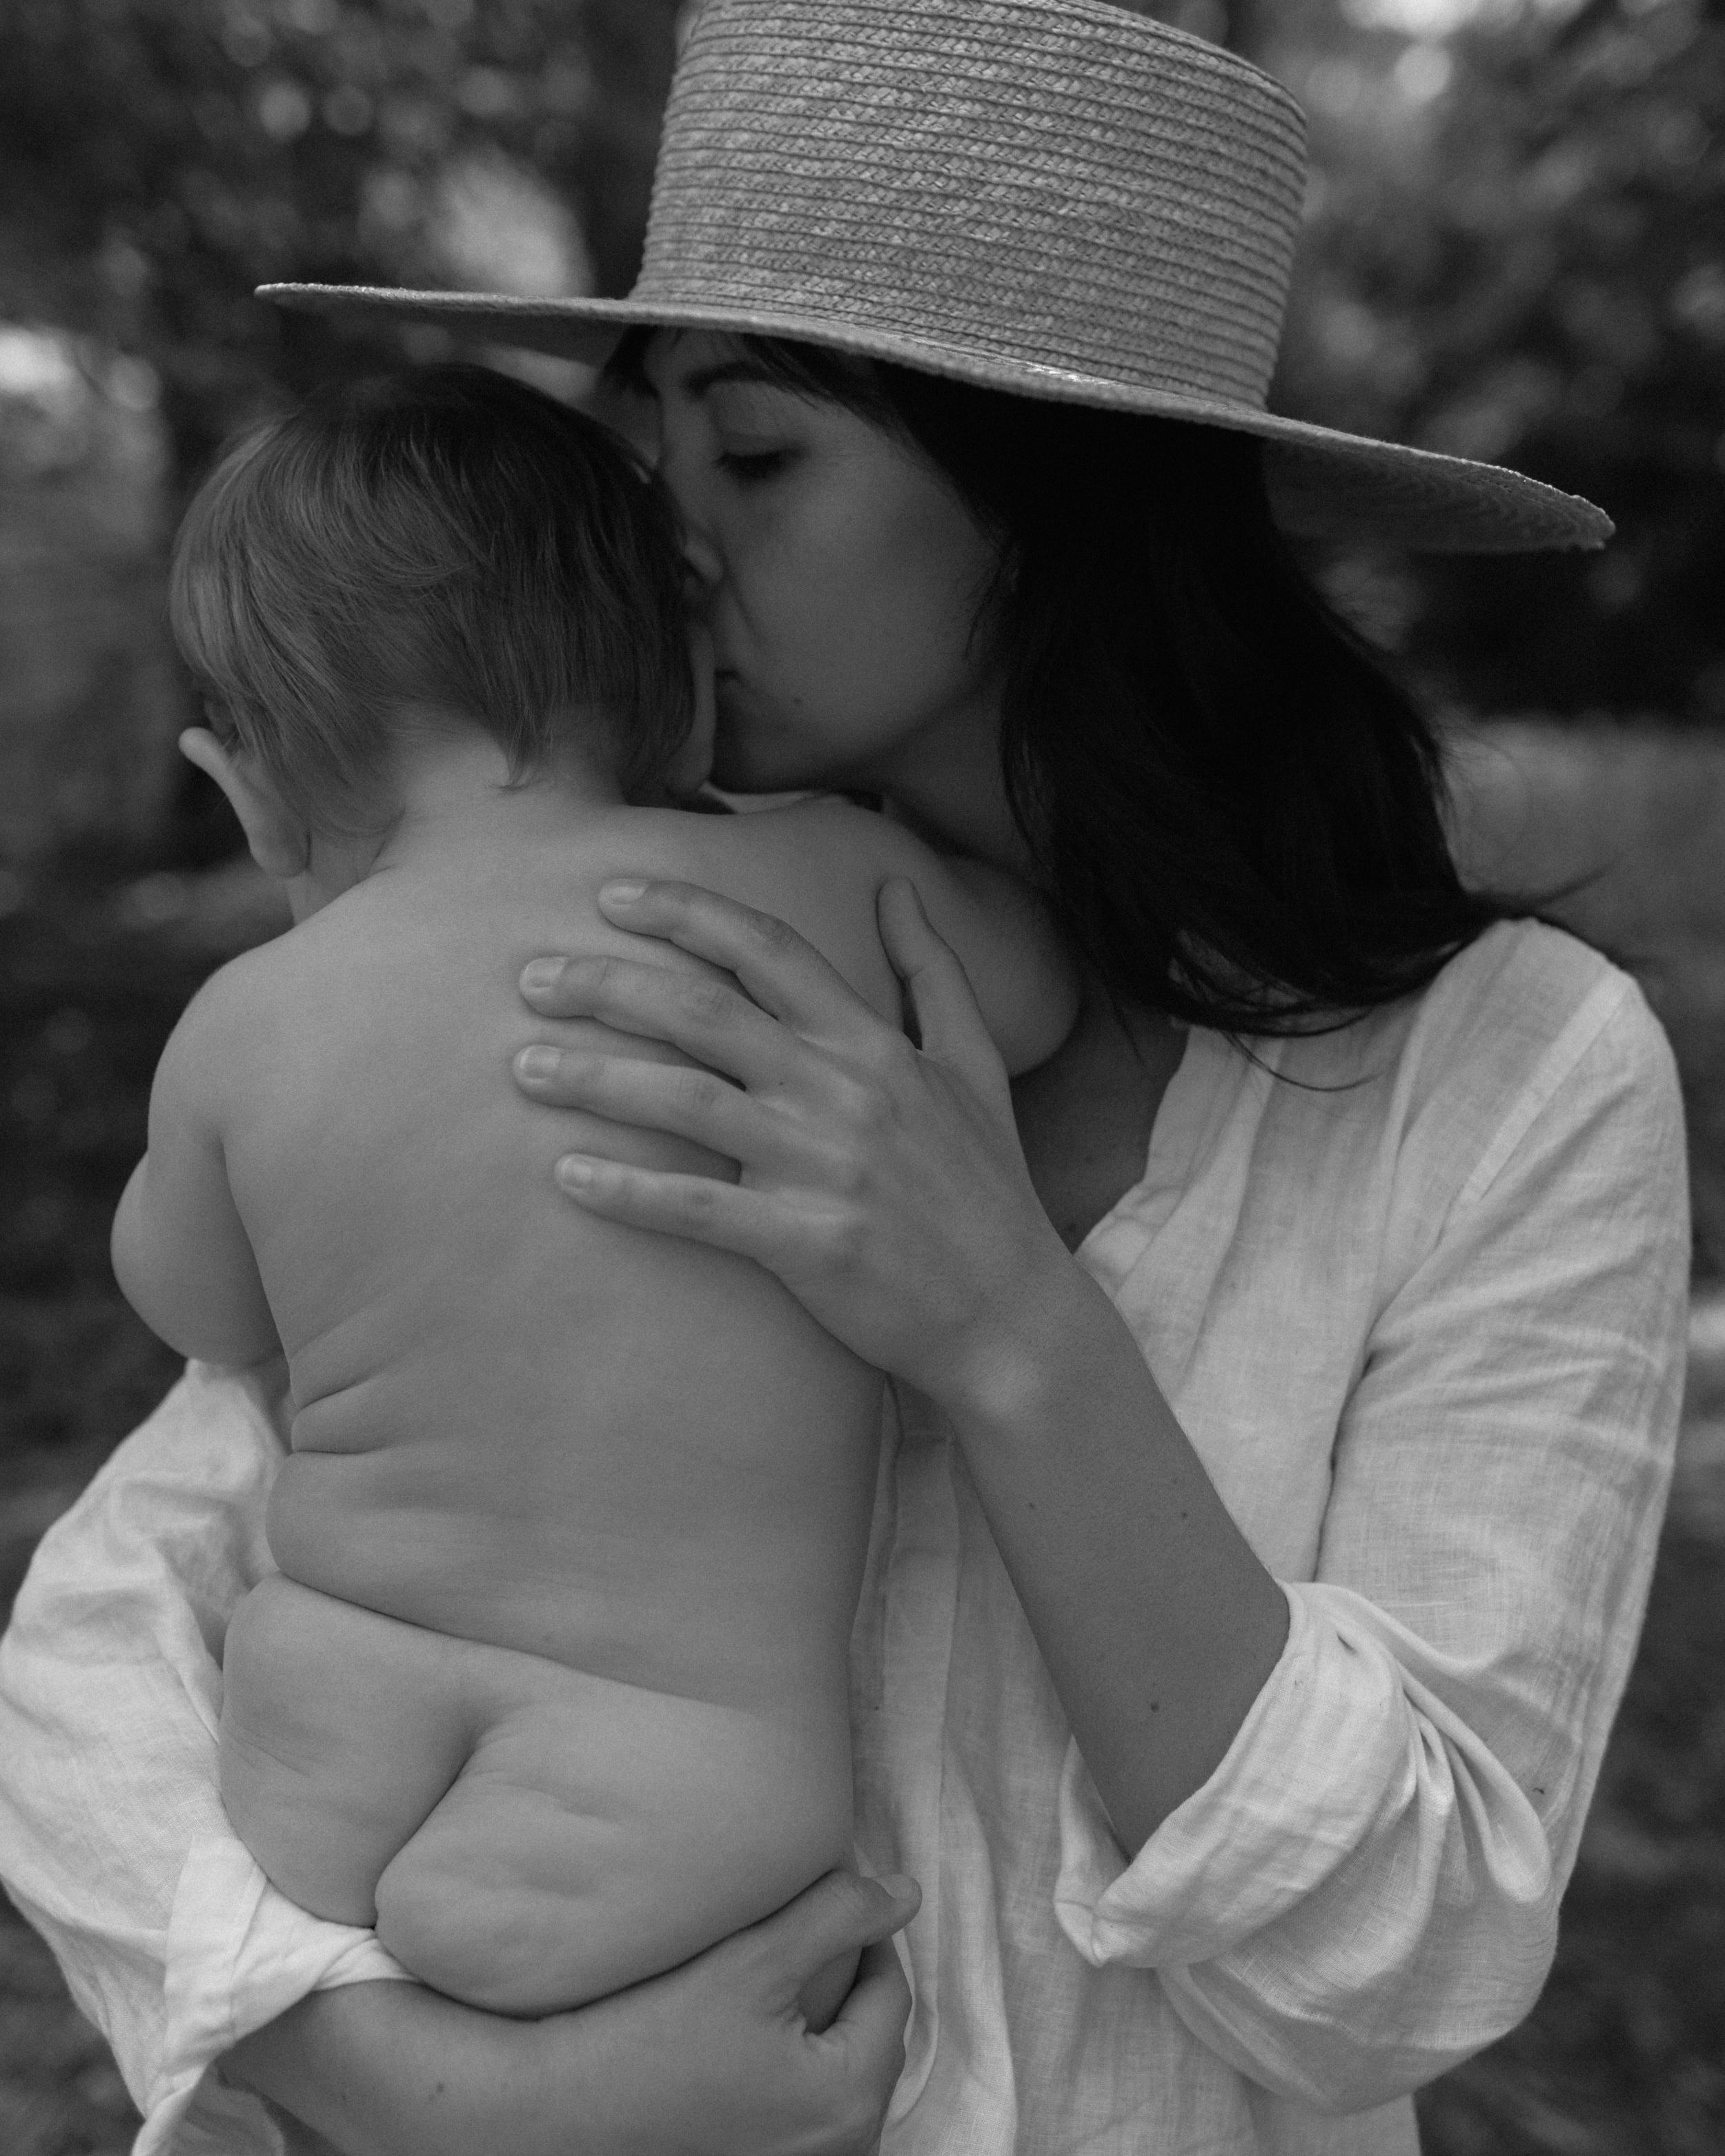 MothersDay-HughandMe-Anna-Howard-2.jpg